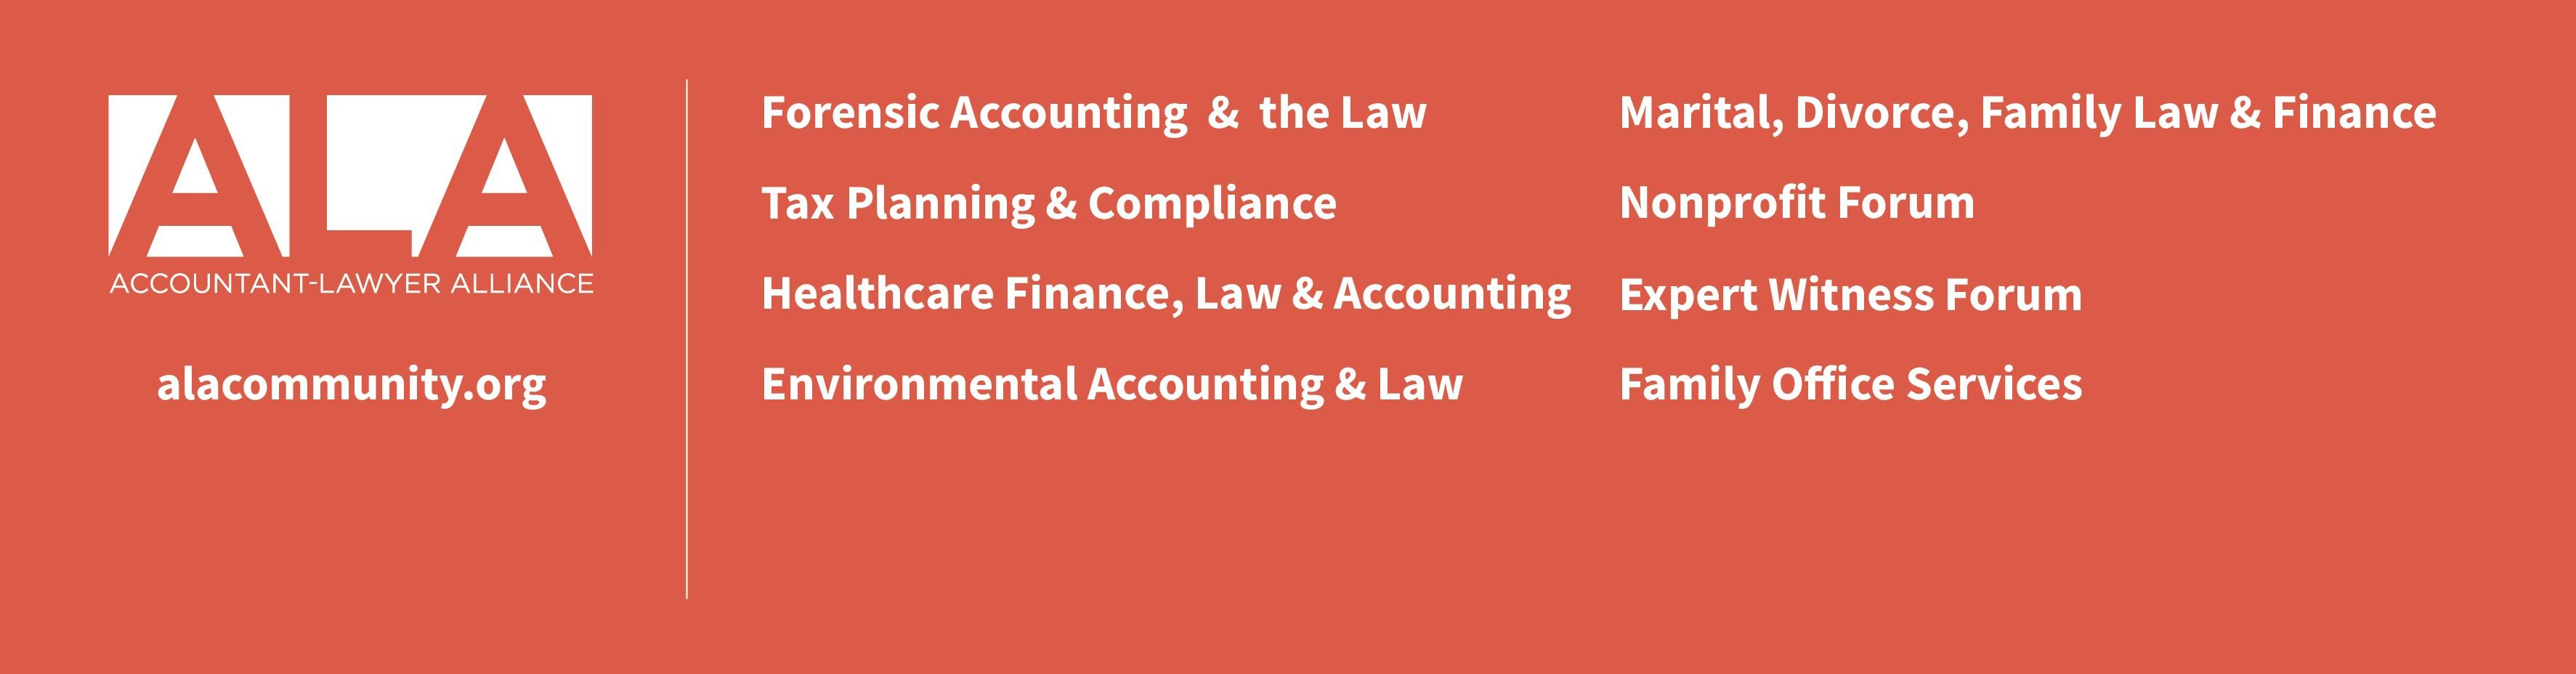 Accountant-Lawyer Alliance Community (ALA)   LinkedIn